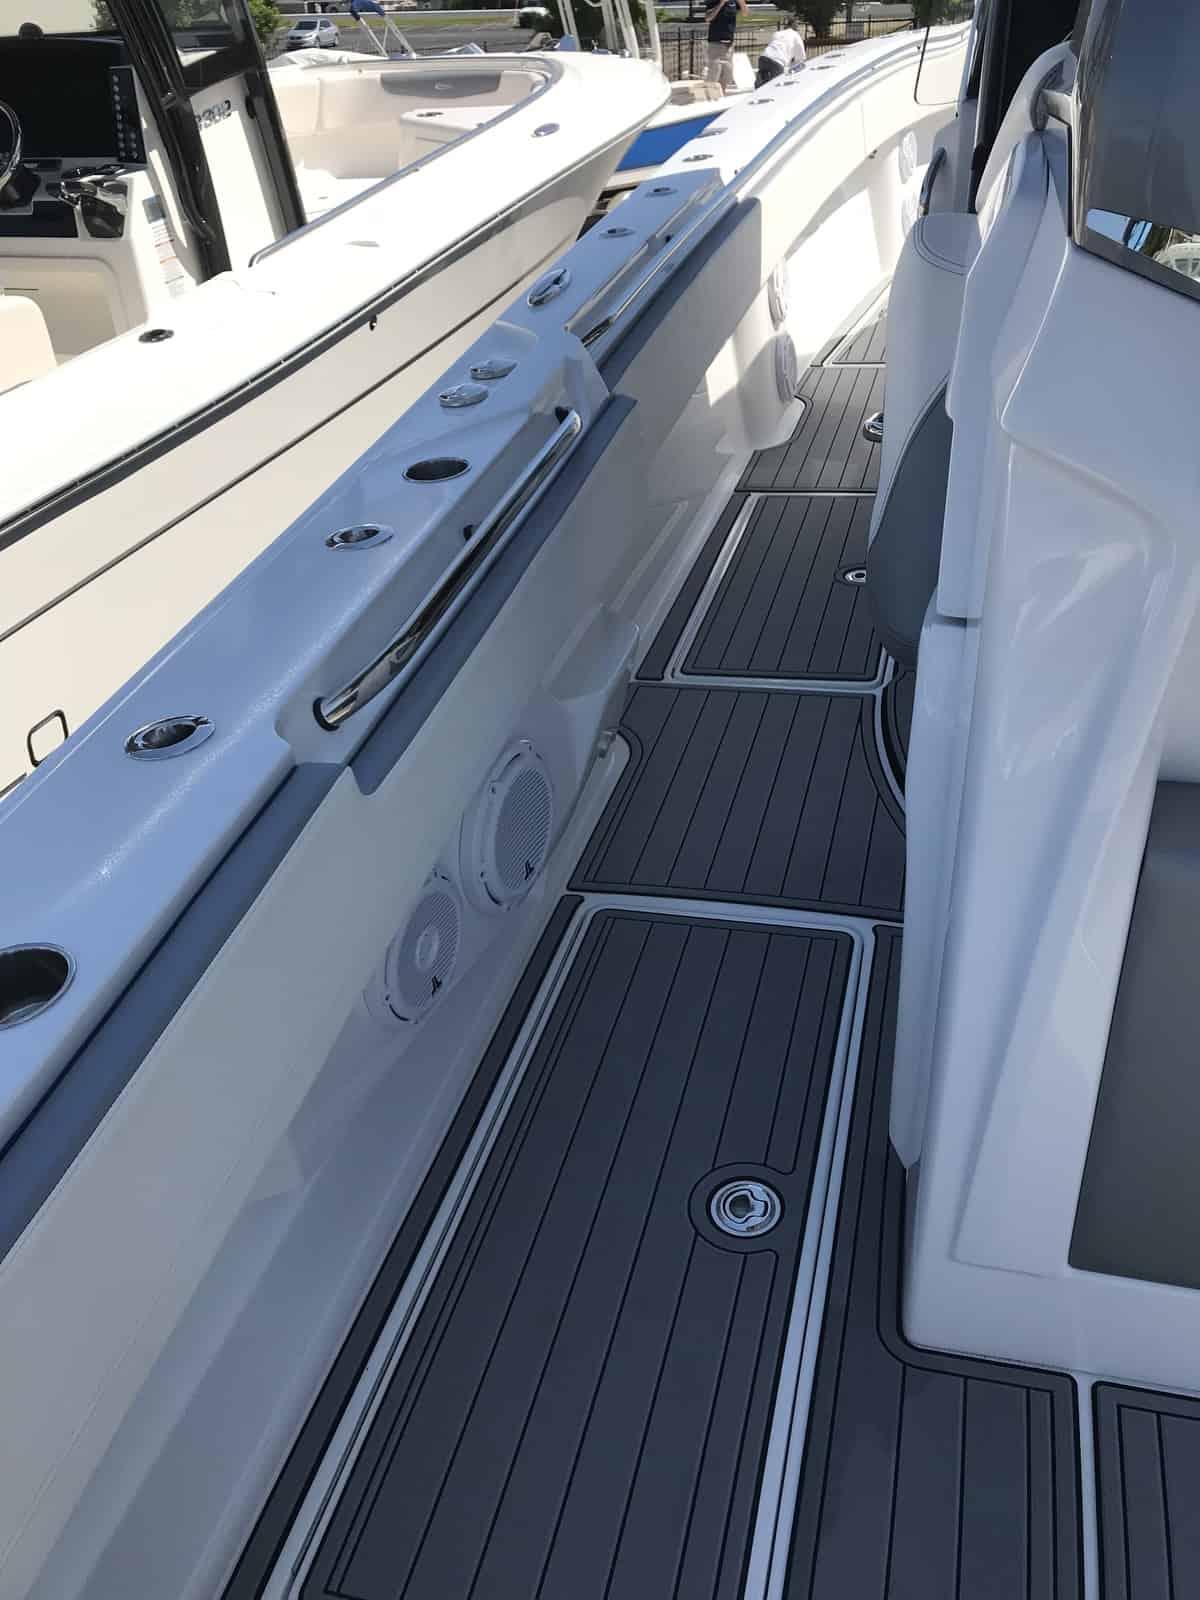 New  2018 45' Nor-tech 452 Fish Boat